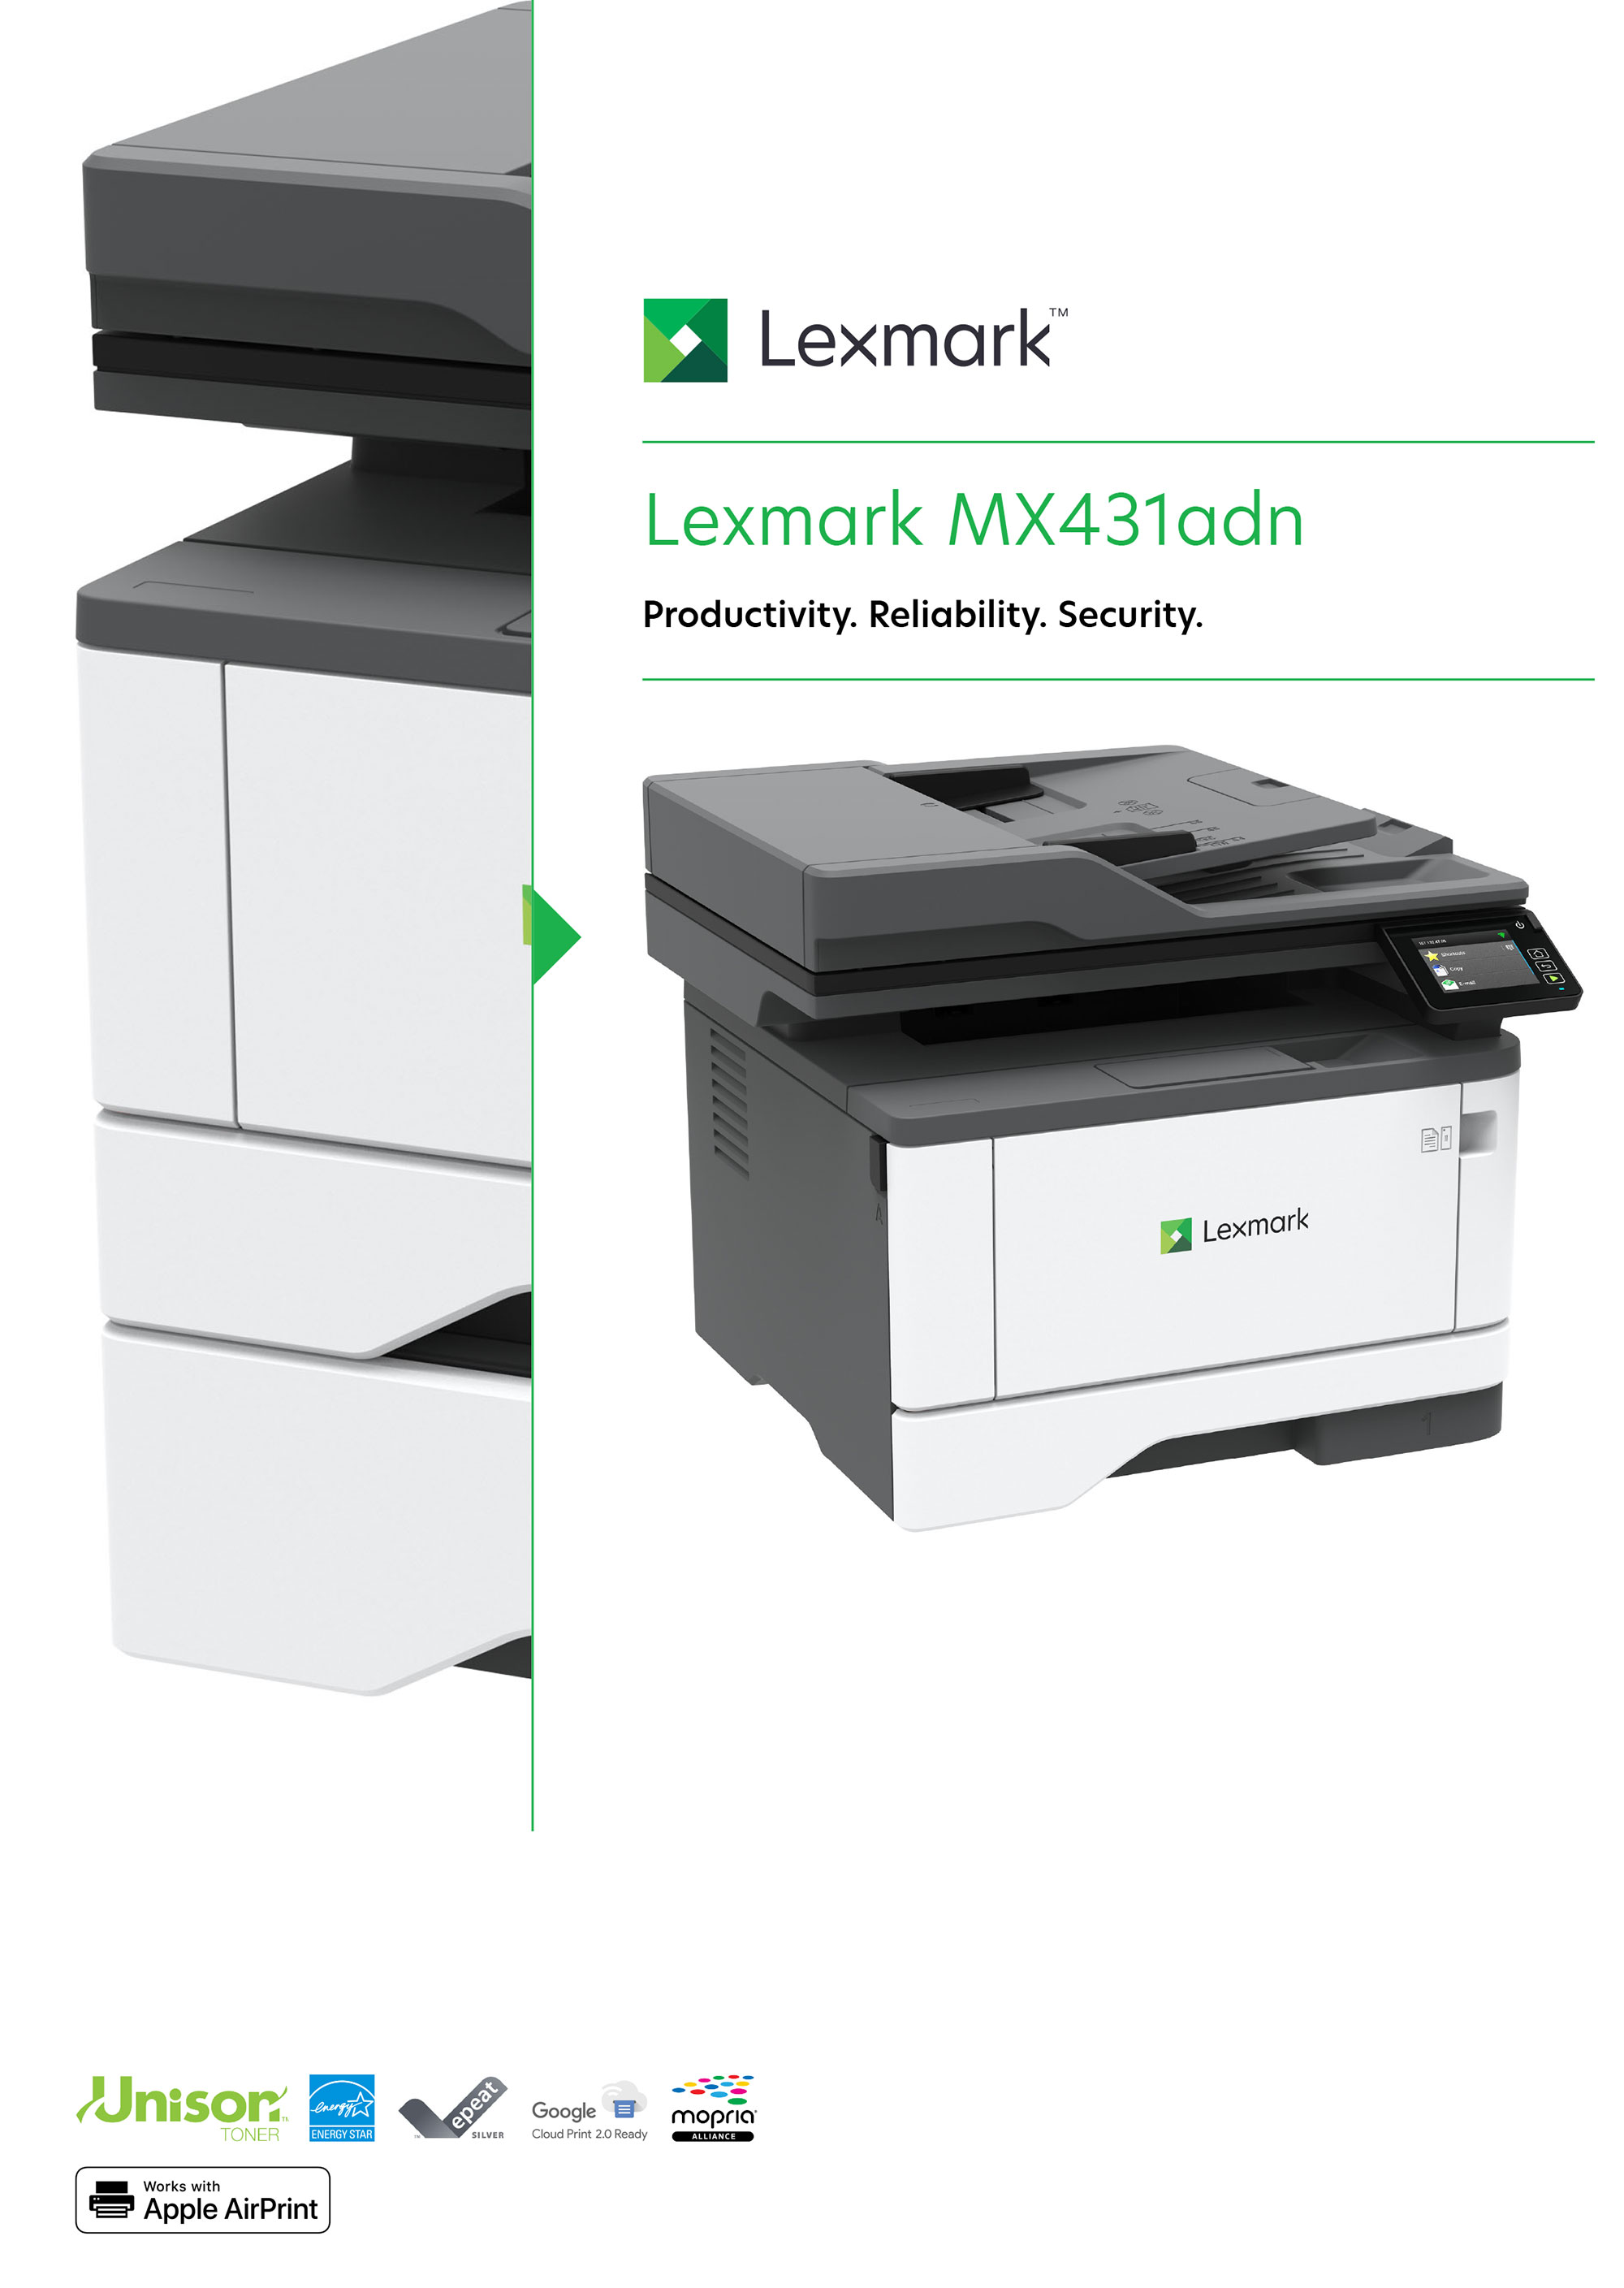 Lexmark MX431adn